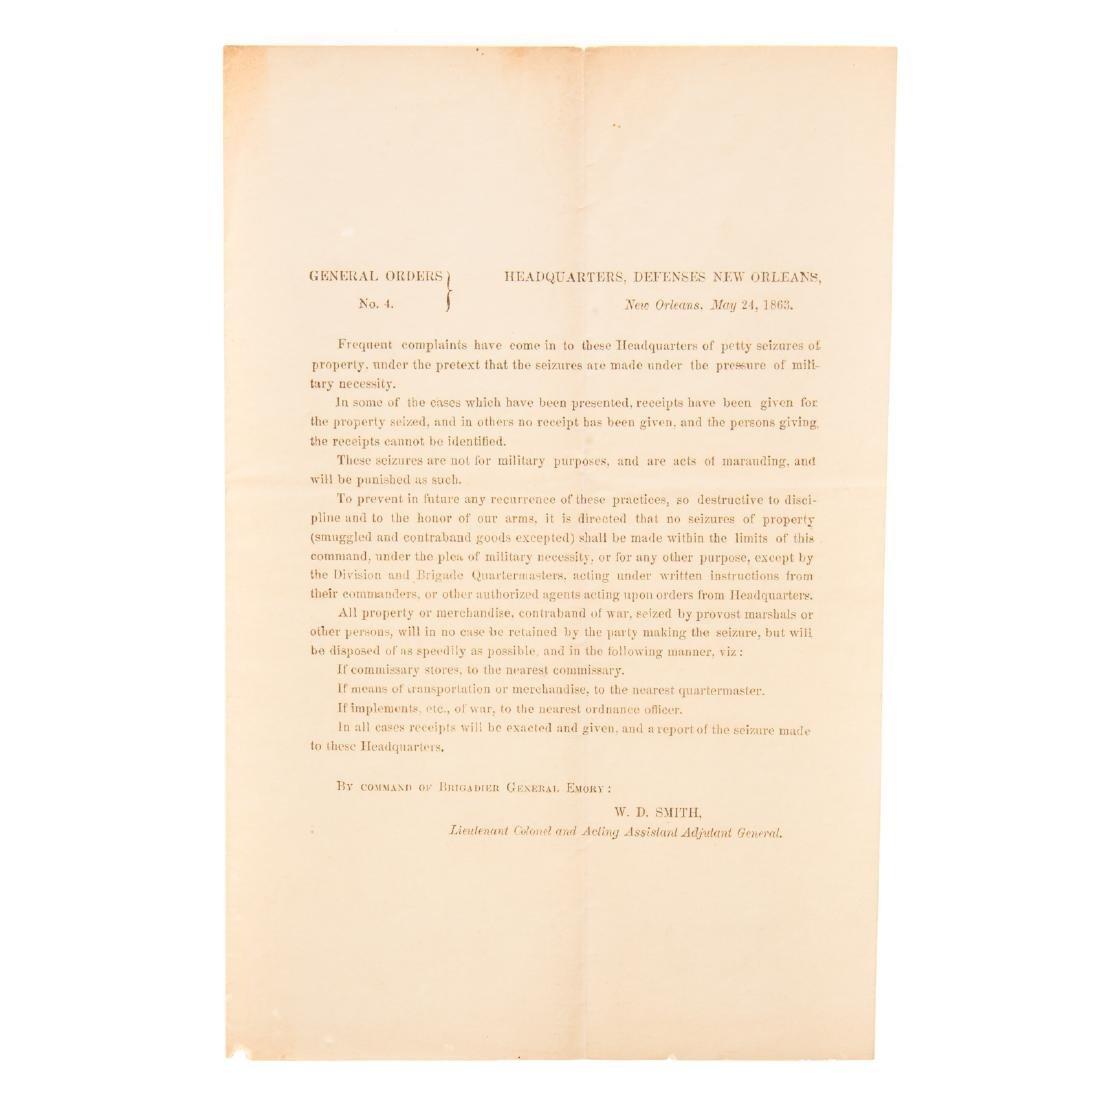 [US] Three Interesting Union Army documents - 3